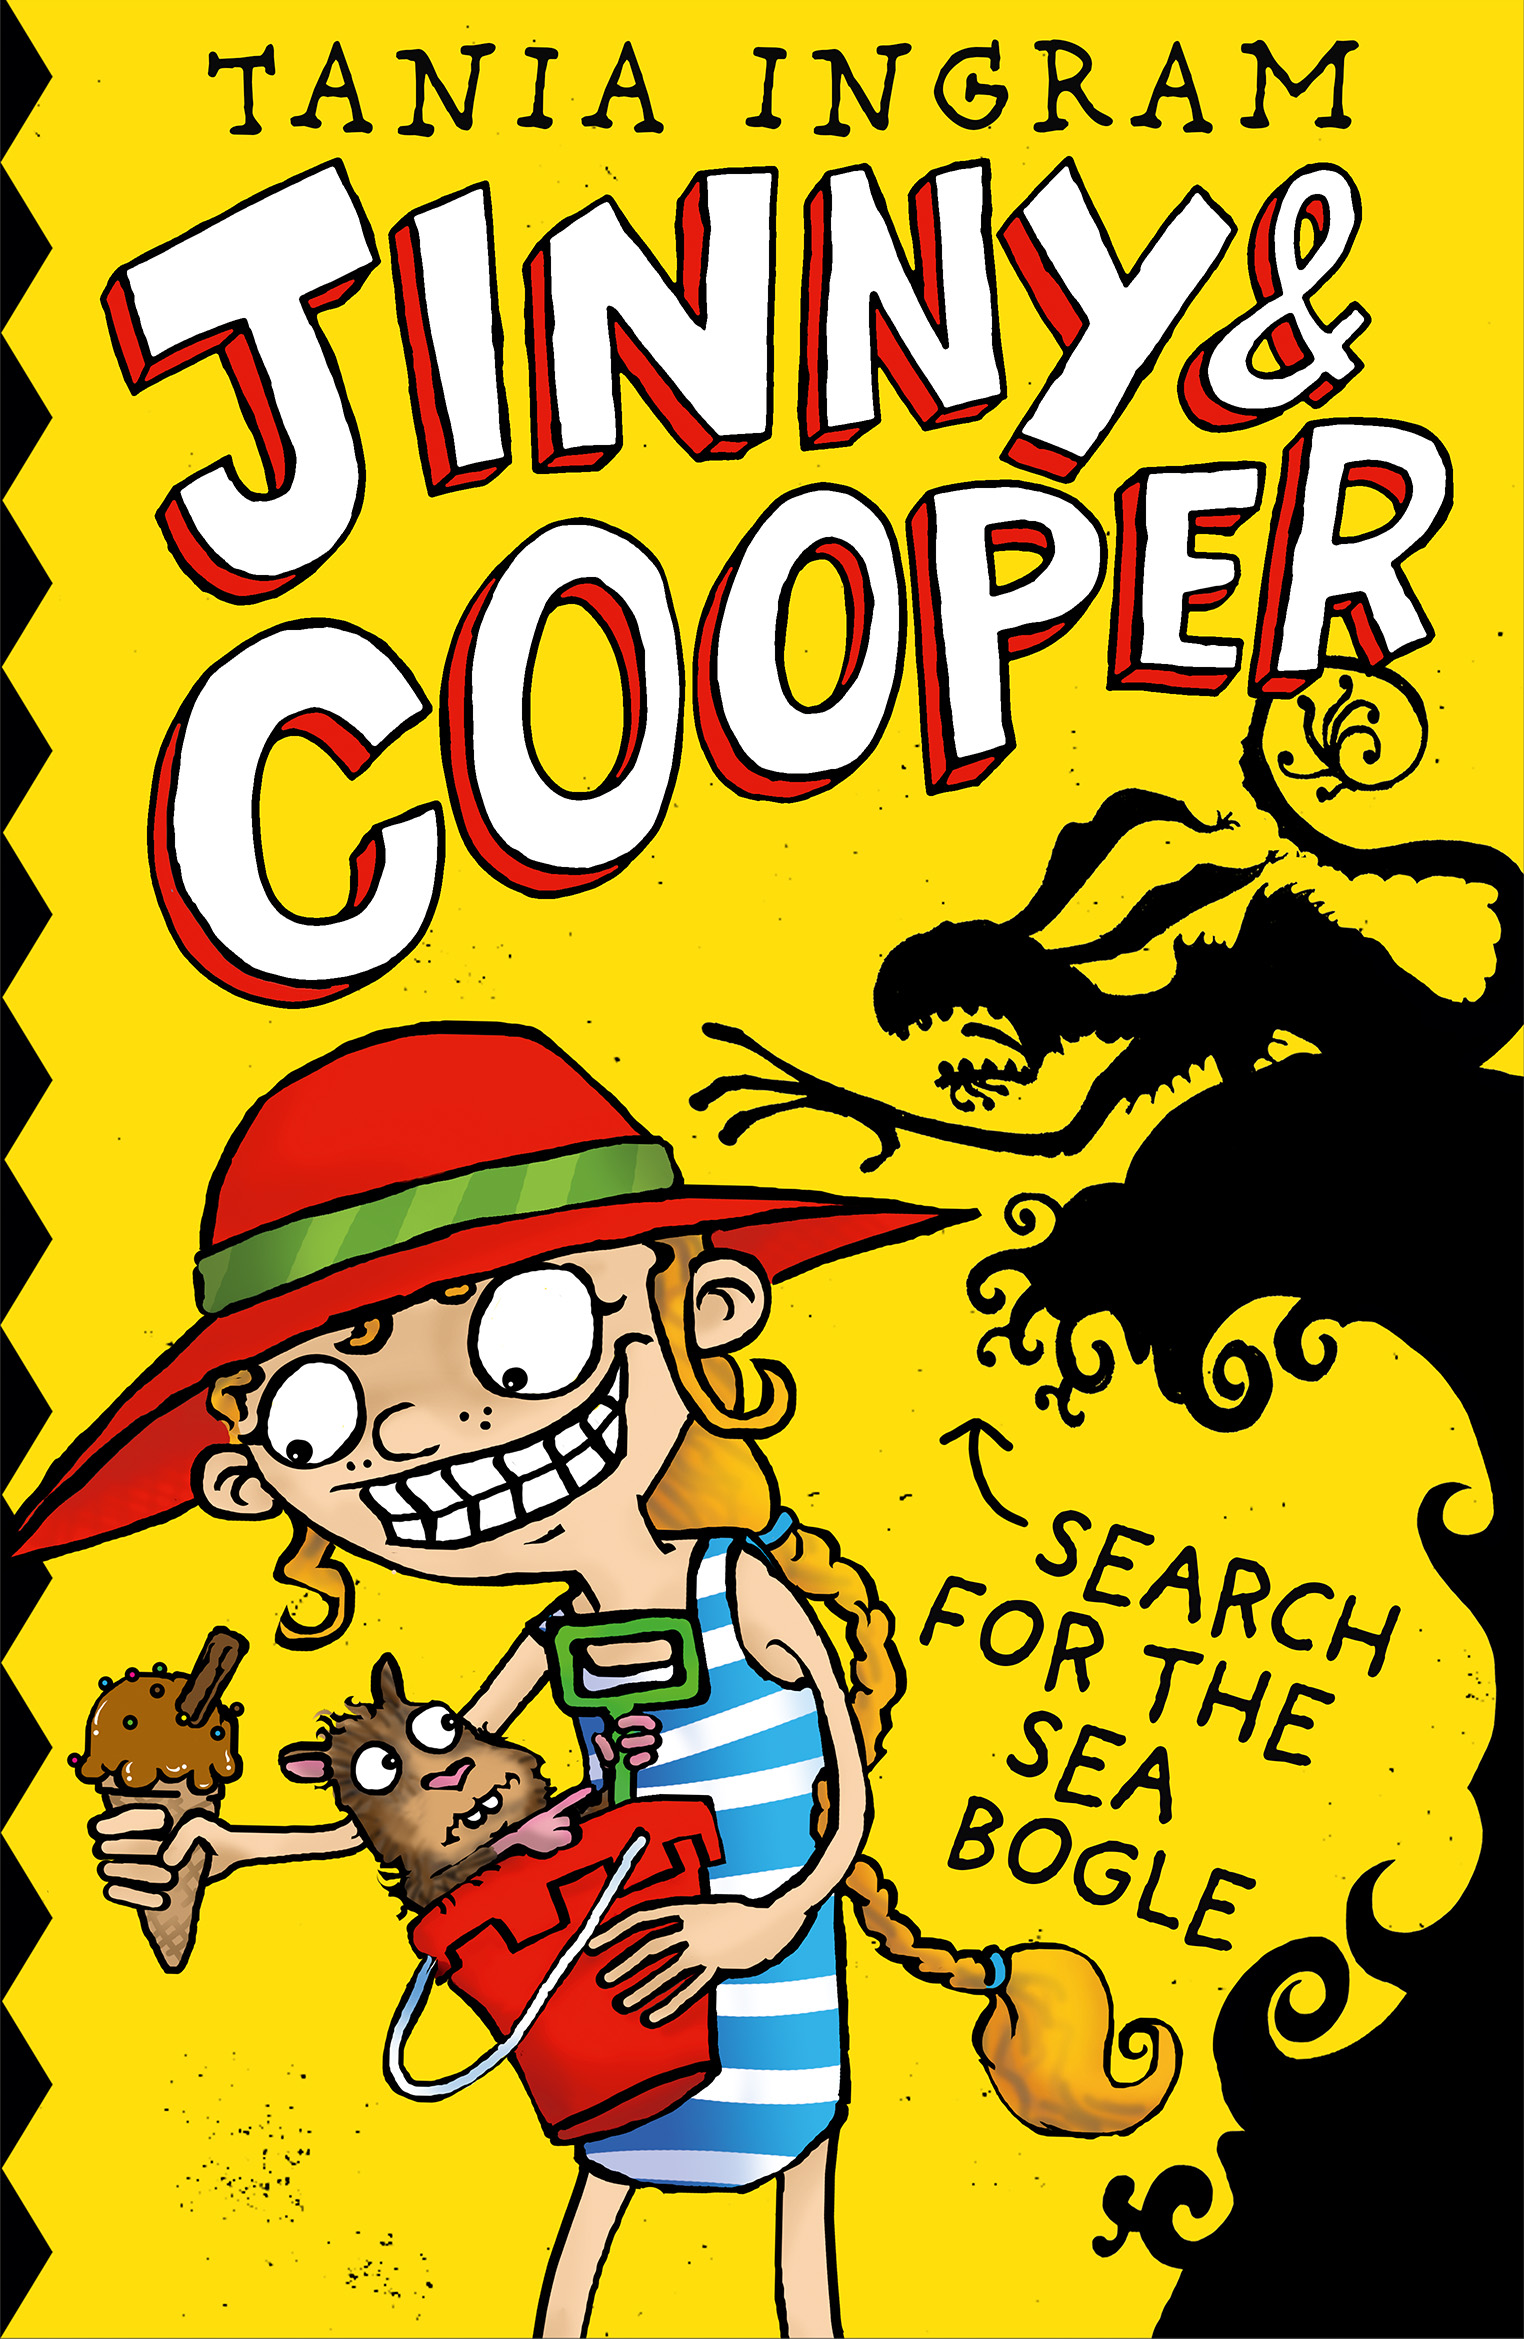 Jinny-Cooper-Search-For-The-Sea-Bogle.jpg